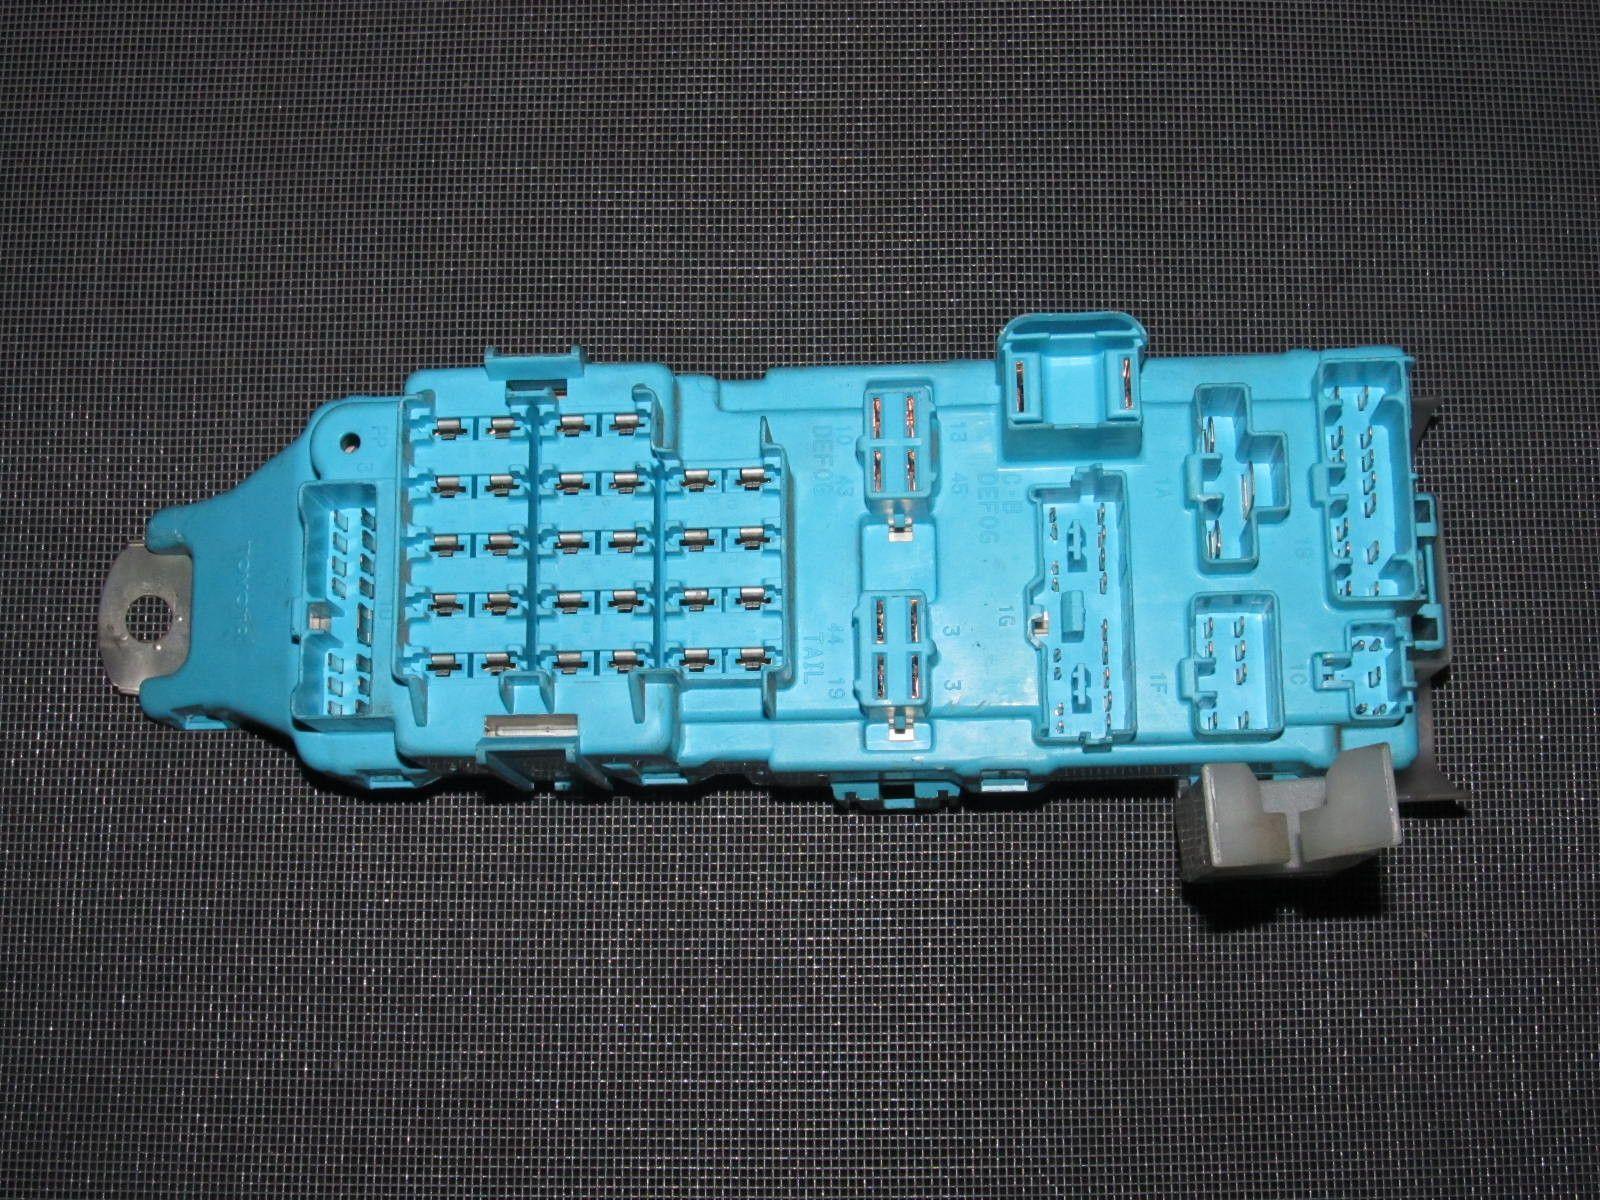 86 92 toyota supra oem interior fuse box autopartone com products  [ 1600 x 1200 Pixel ]